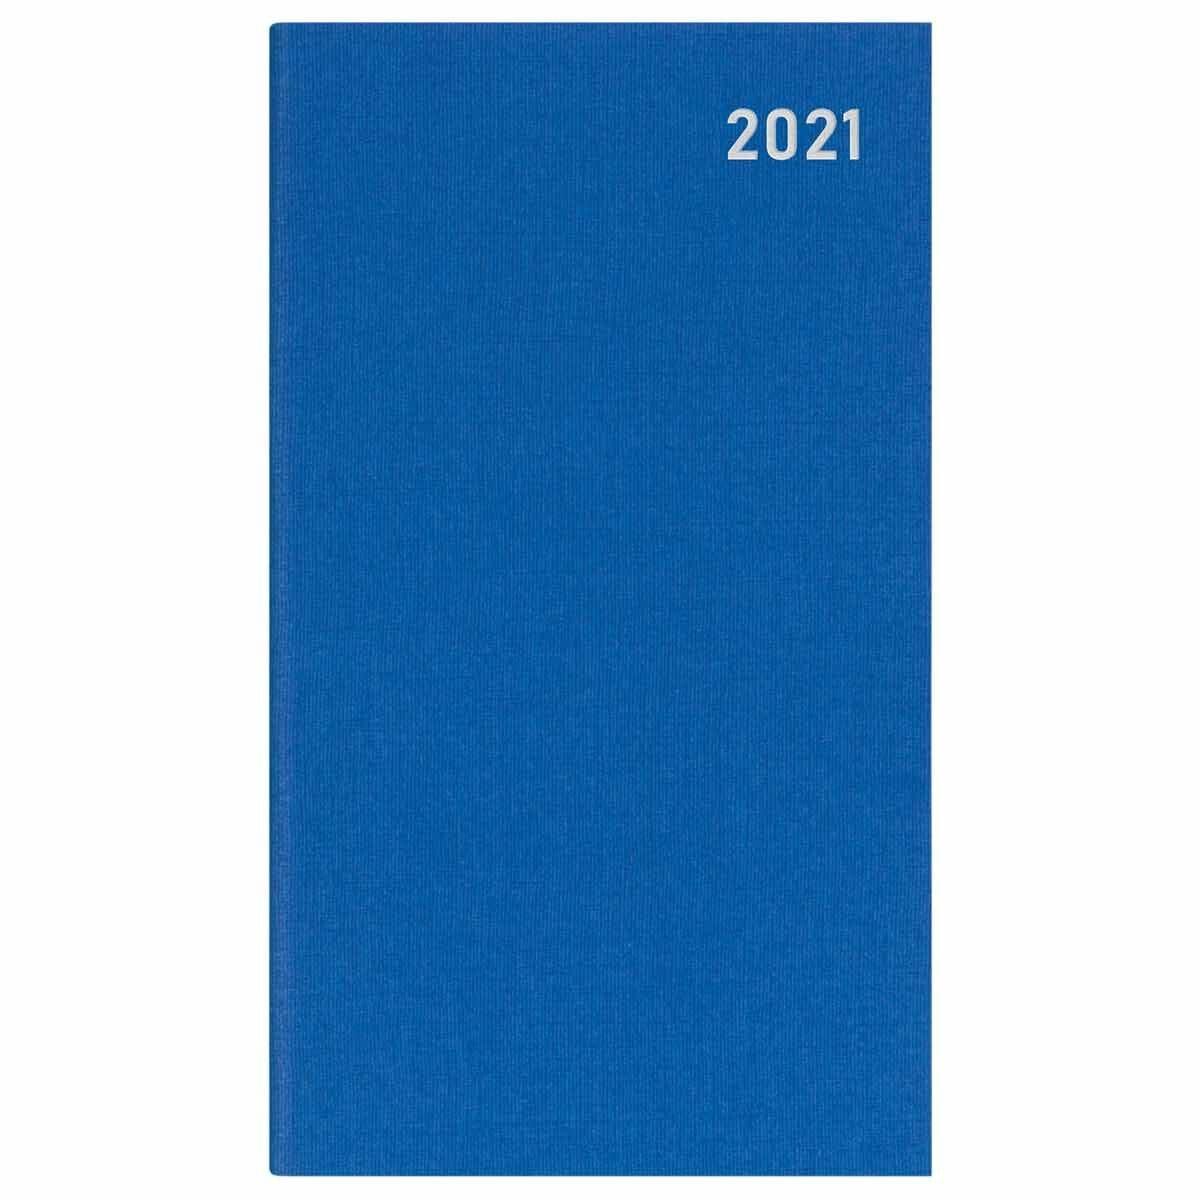 Letts Principal Diary Week to View Medium Pocket 2021